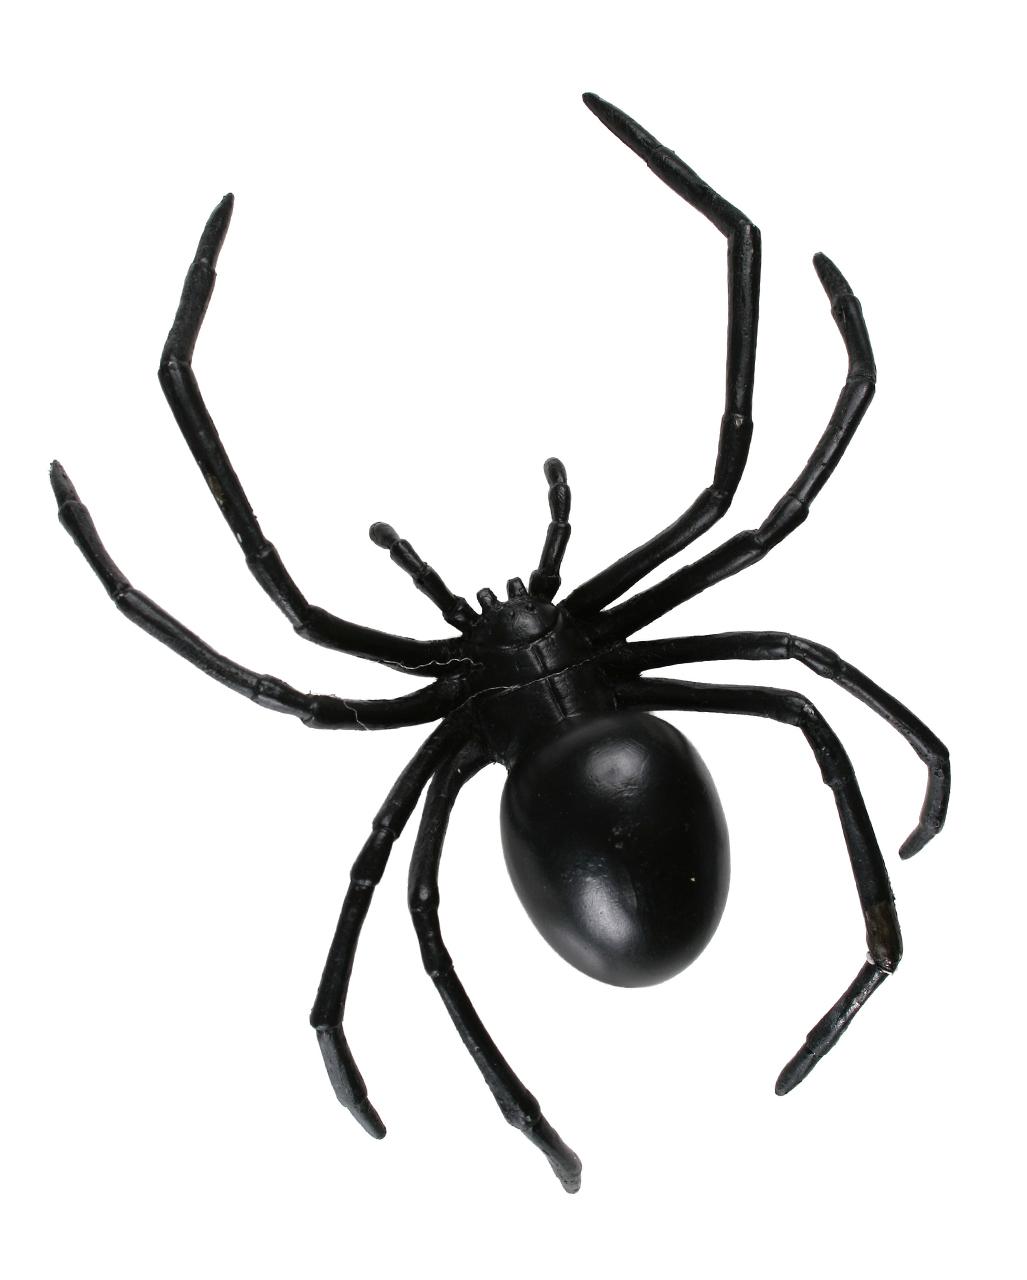 Halloween Plastic Black Spider Decoration Funny Joking Toys  Realistic Prop BS